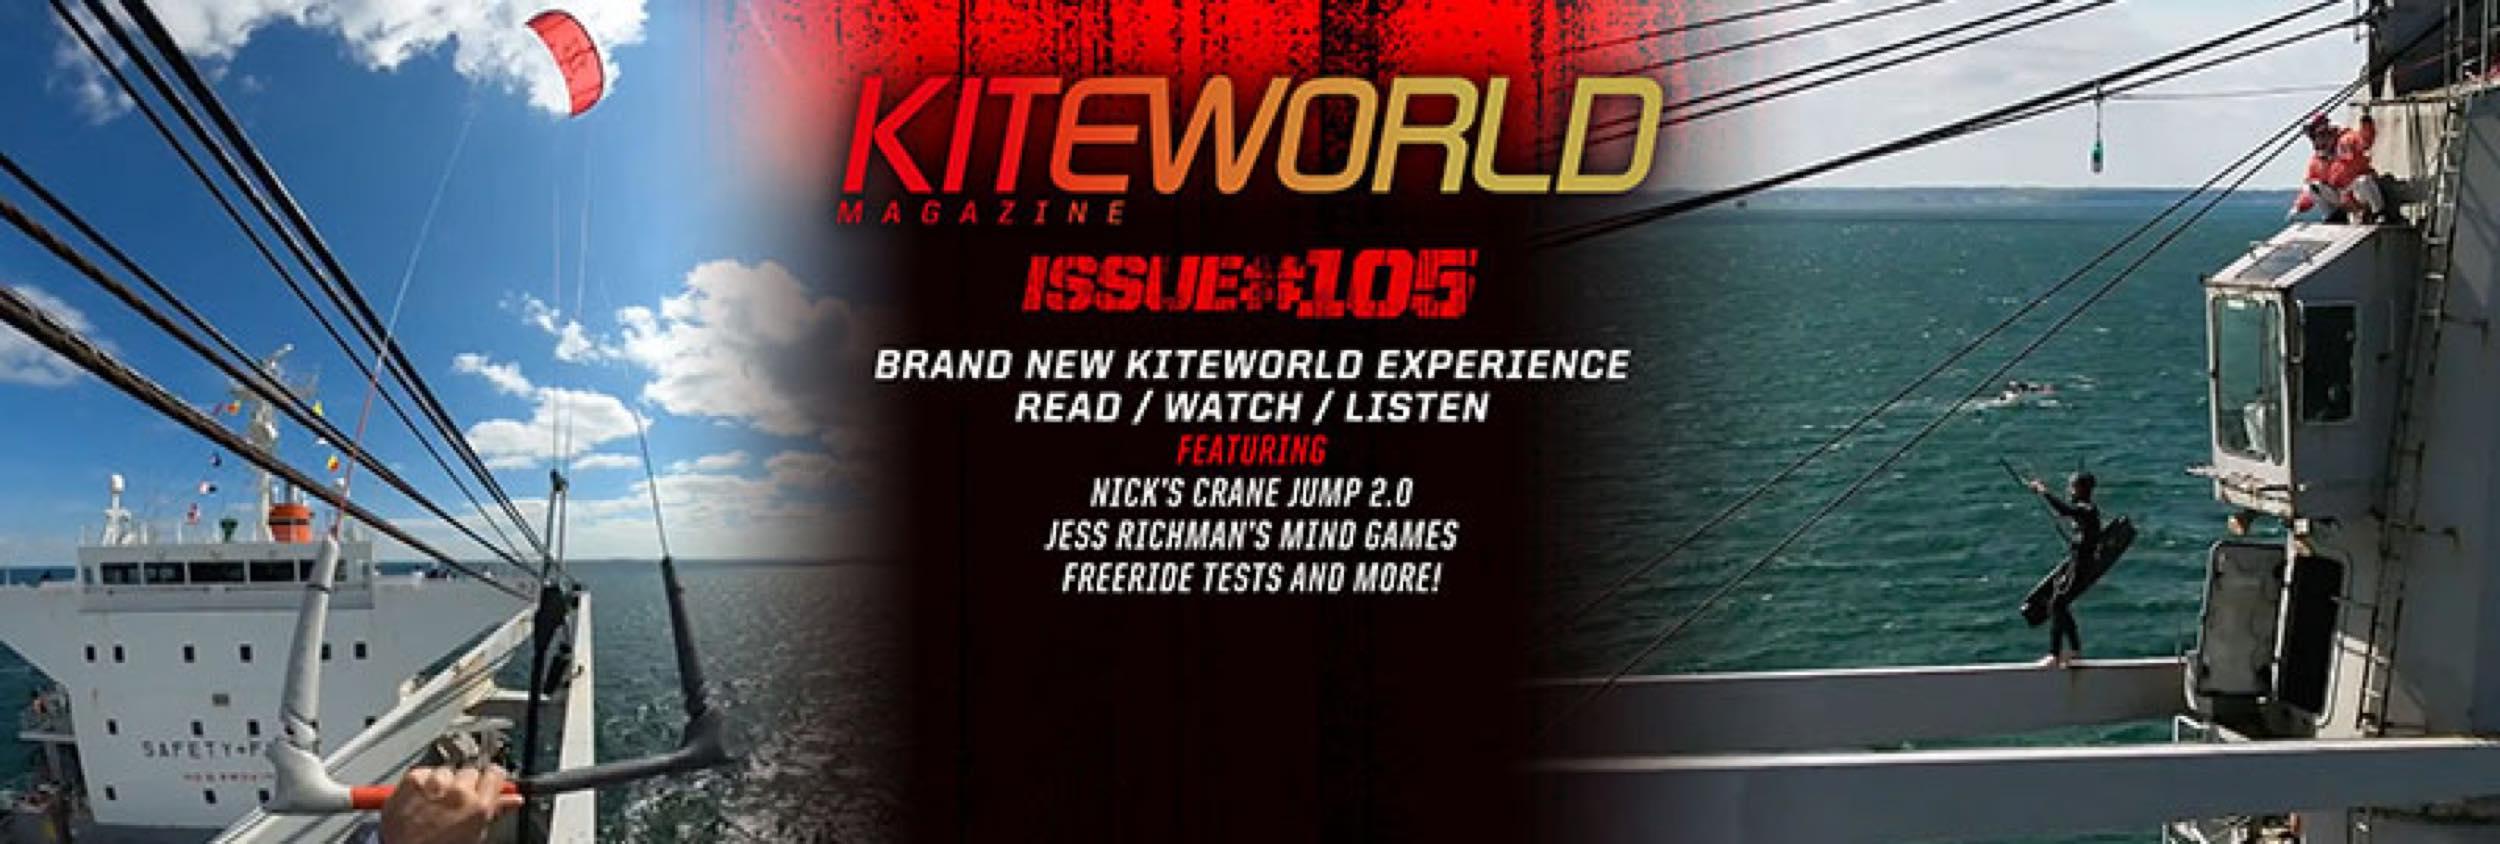 Free Kiteworld Issue 105